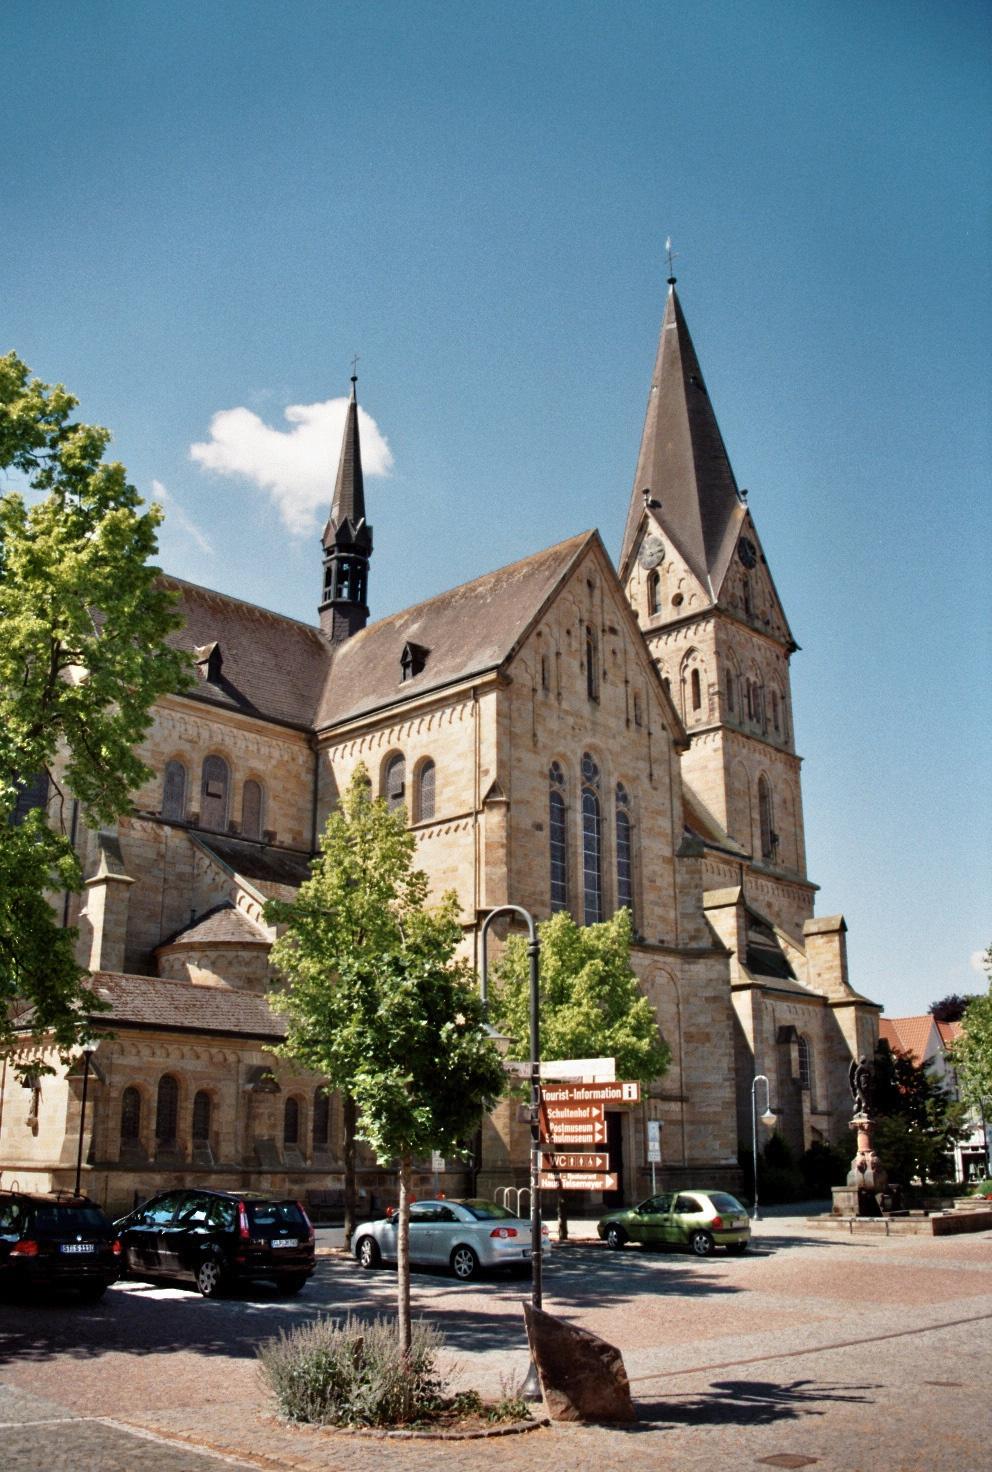 File:Mettingen Marktplatz.jpg - Wikimedia Commons